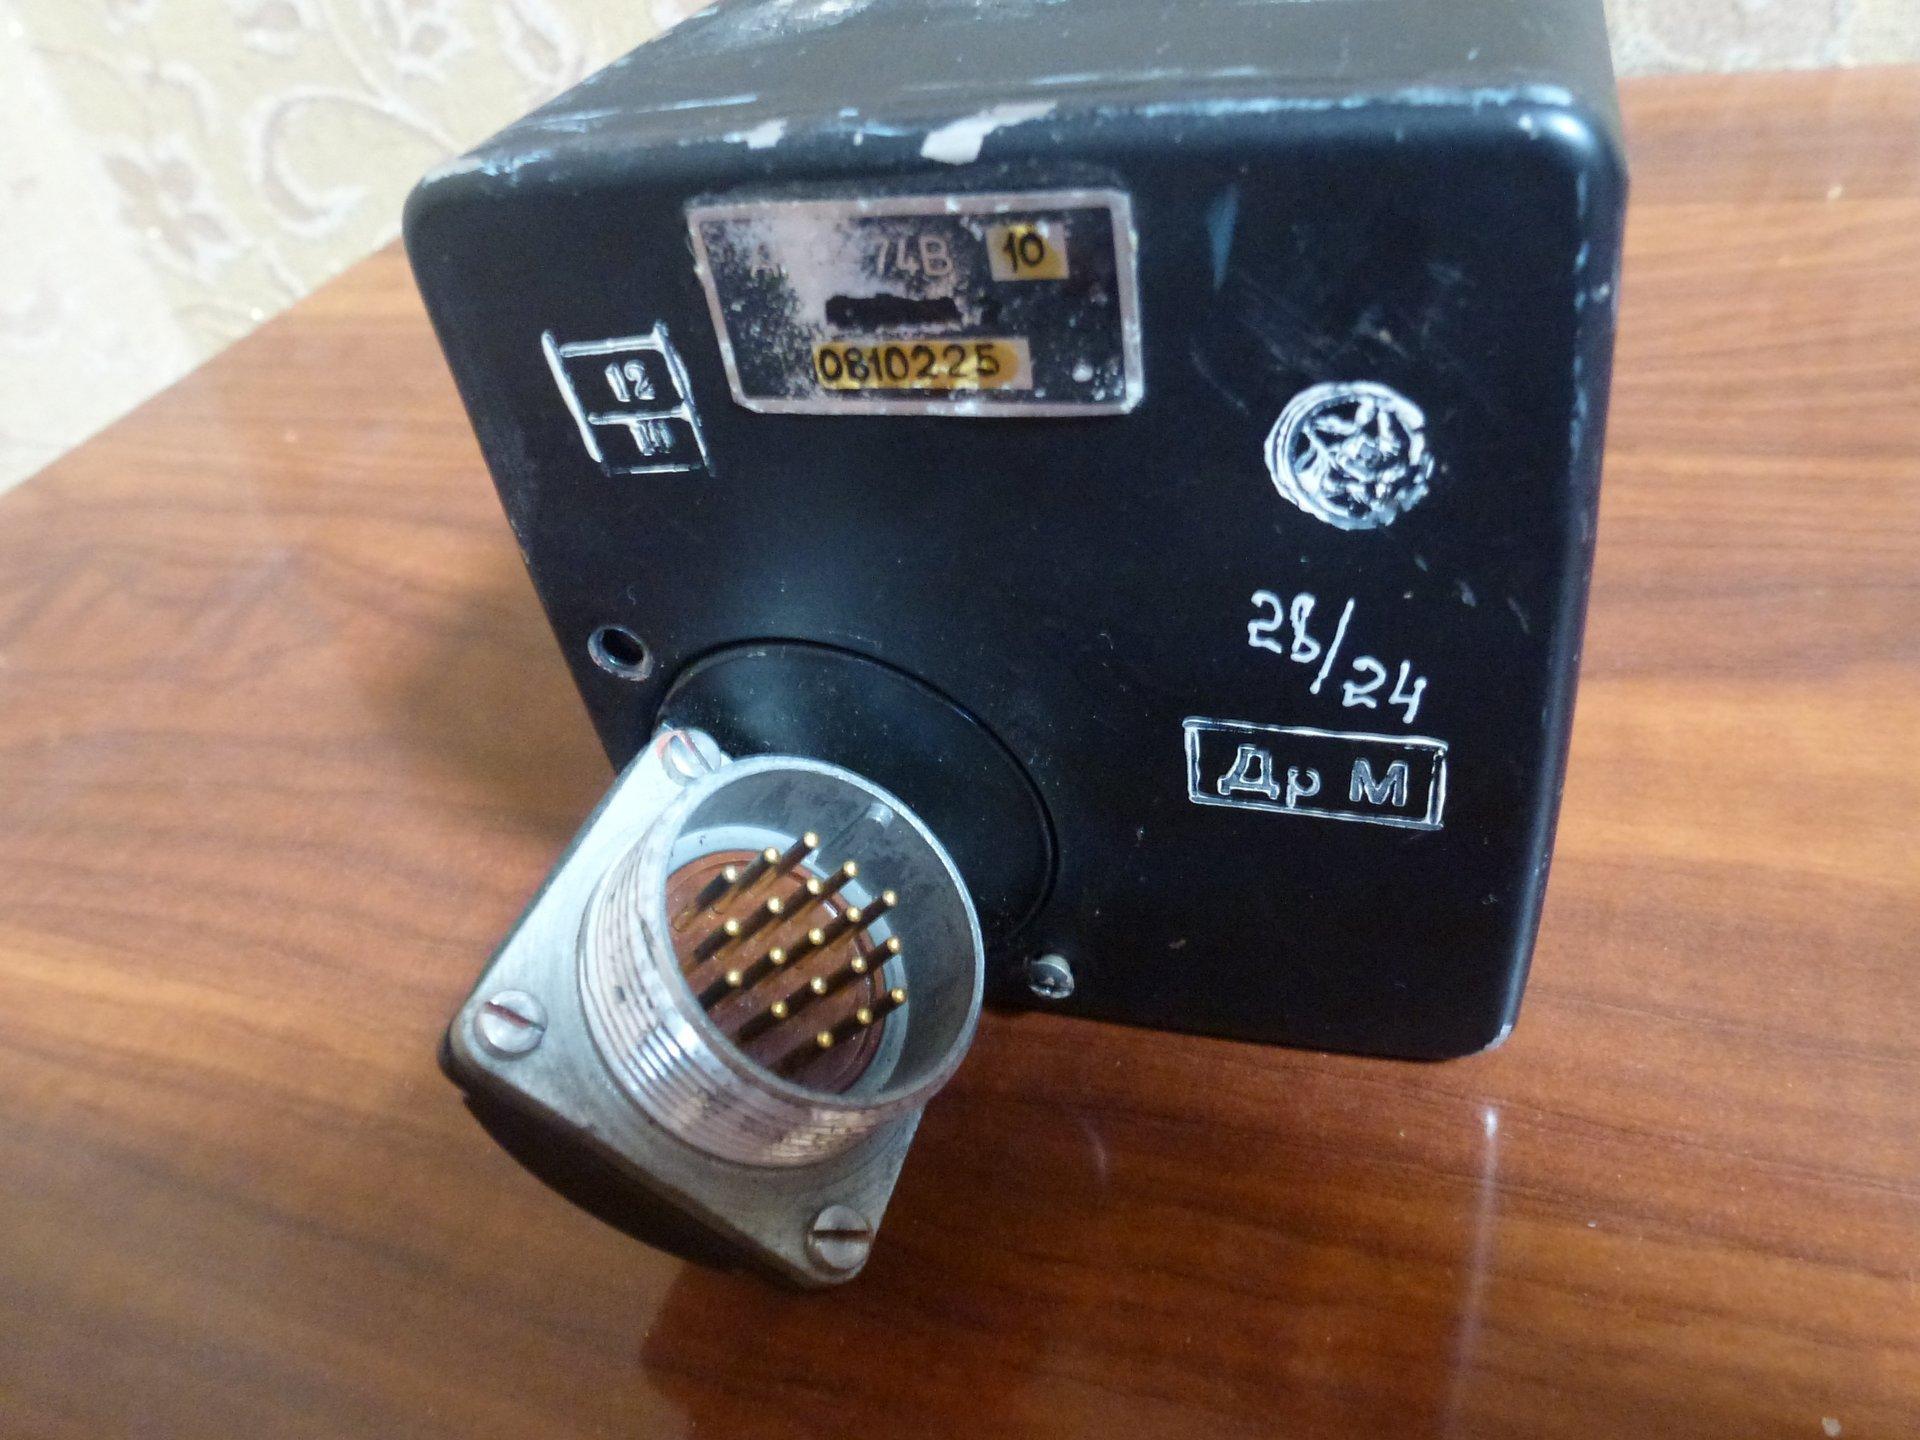 P1150272.JPG